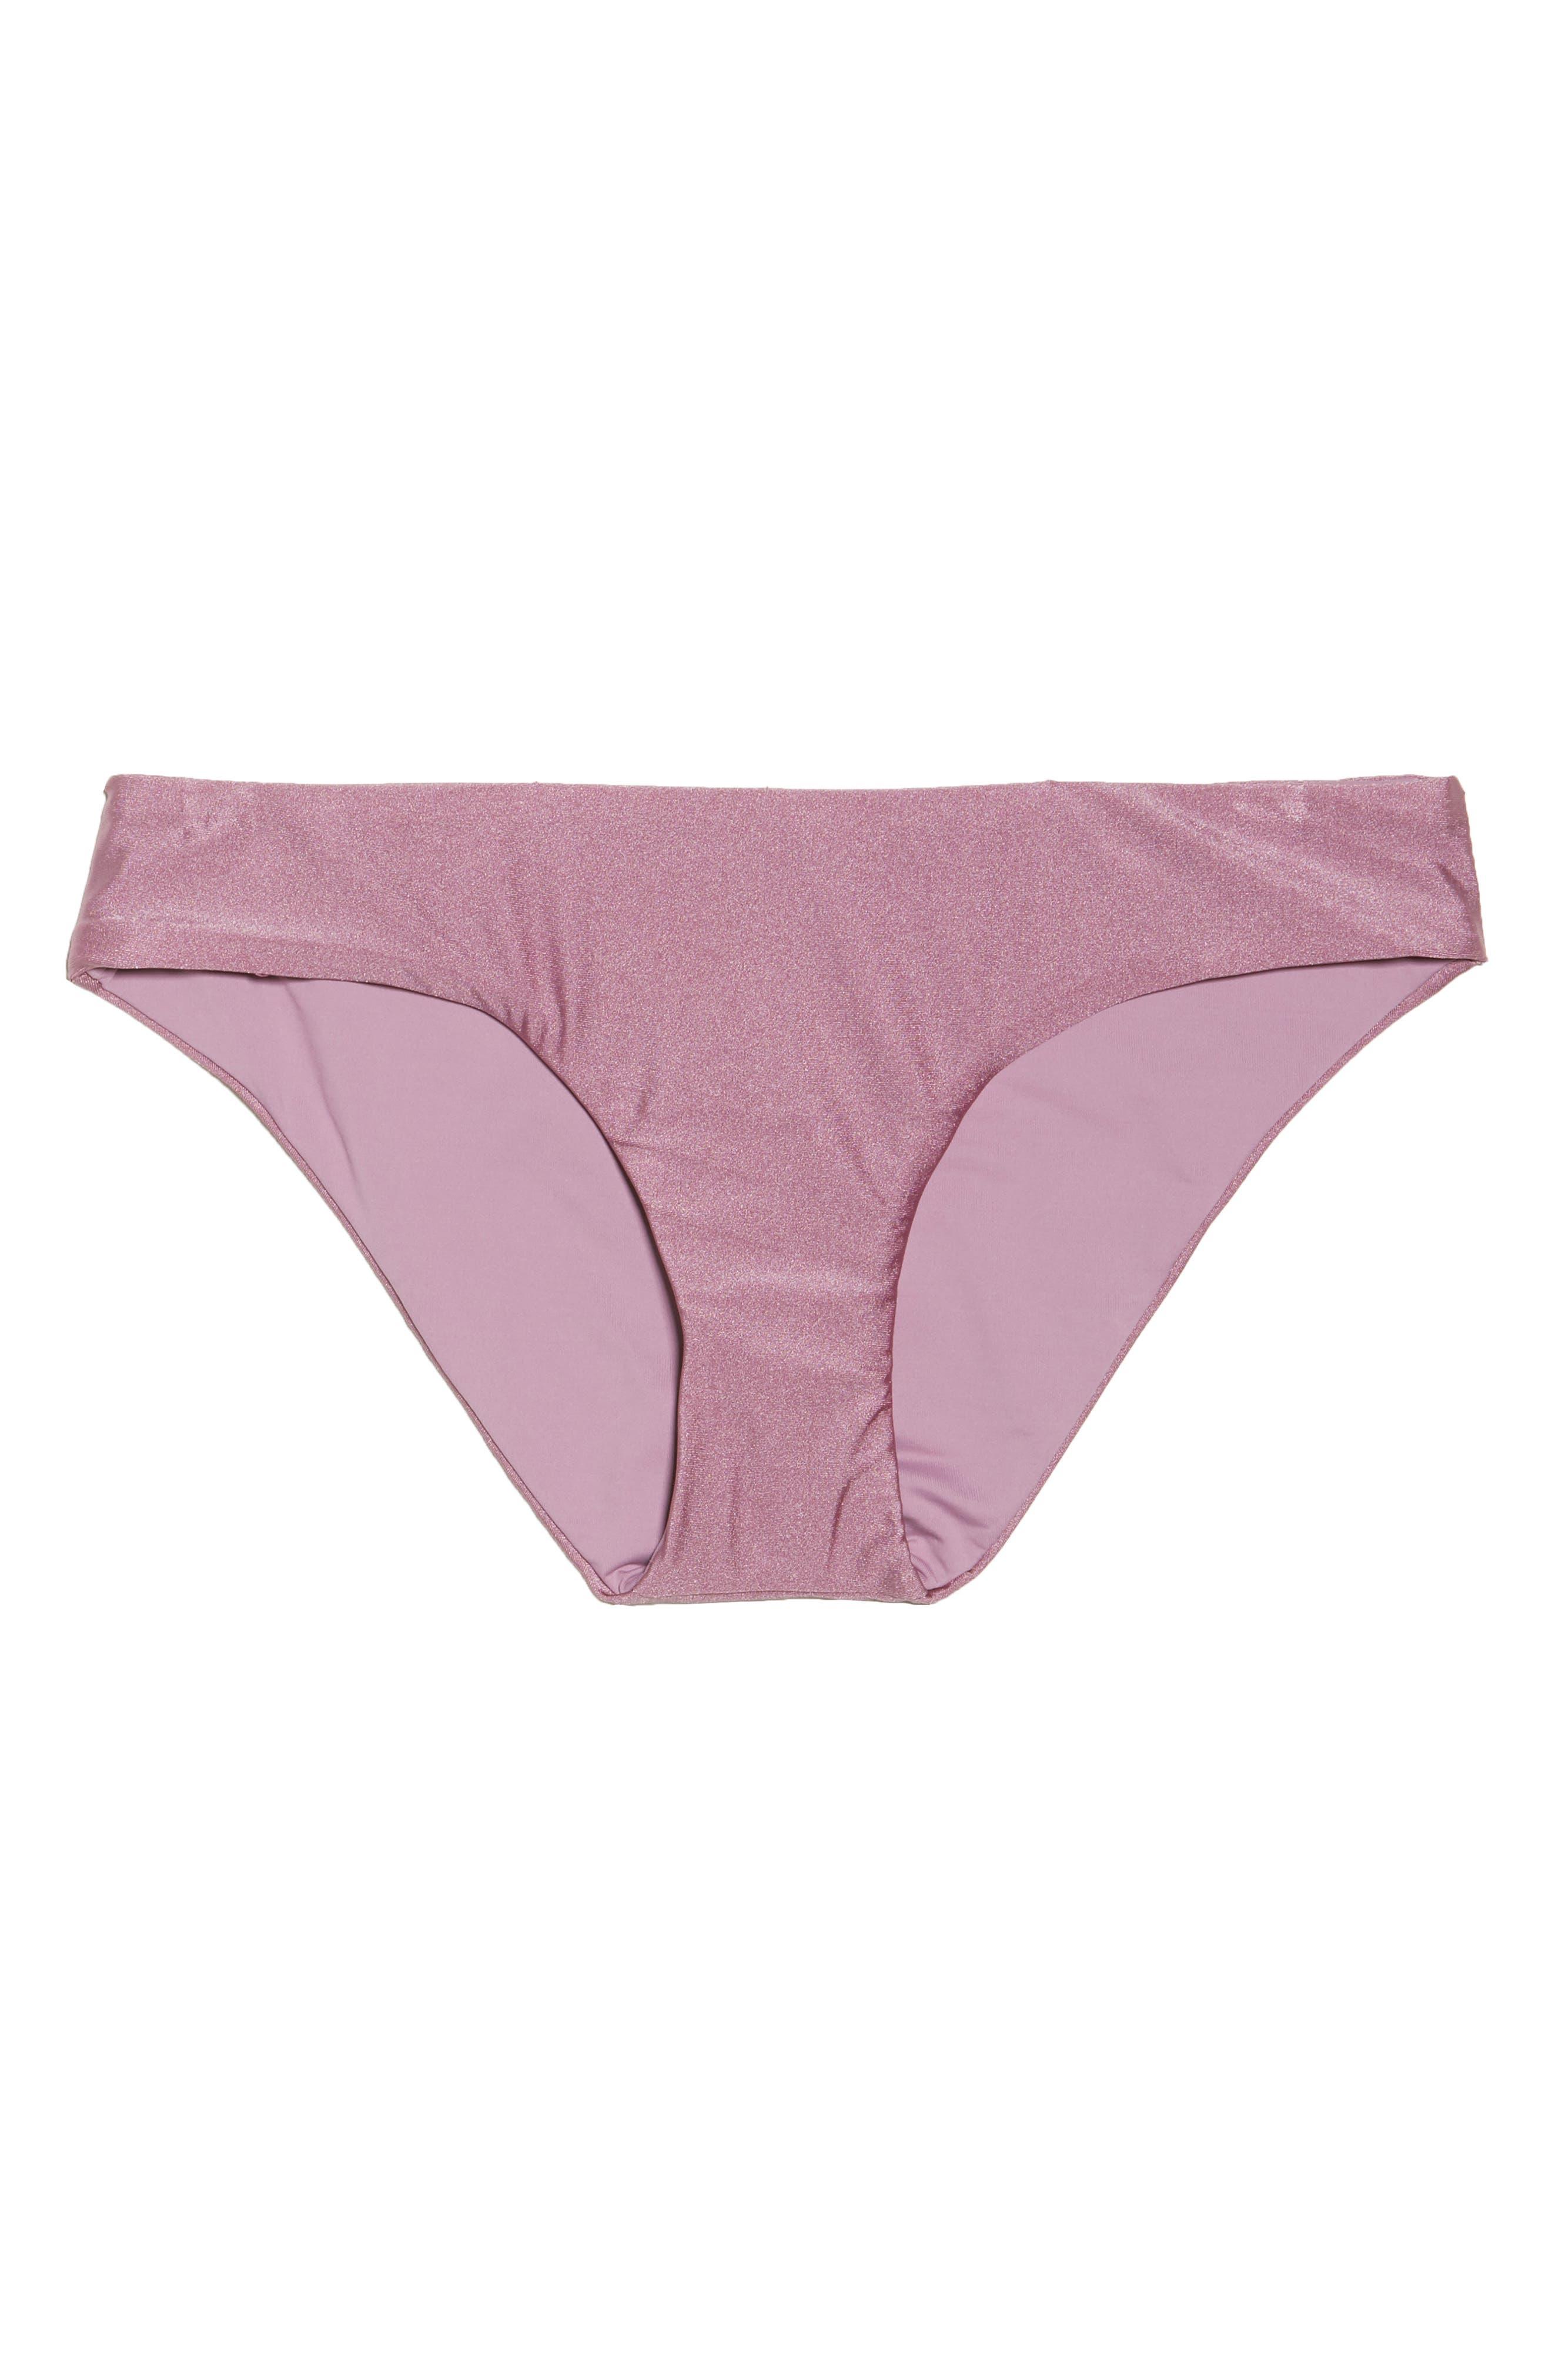 Ballerina Bikini Bottoms,                             Alternate thumbnail 8, color,                             Mauve